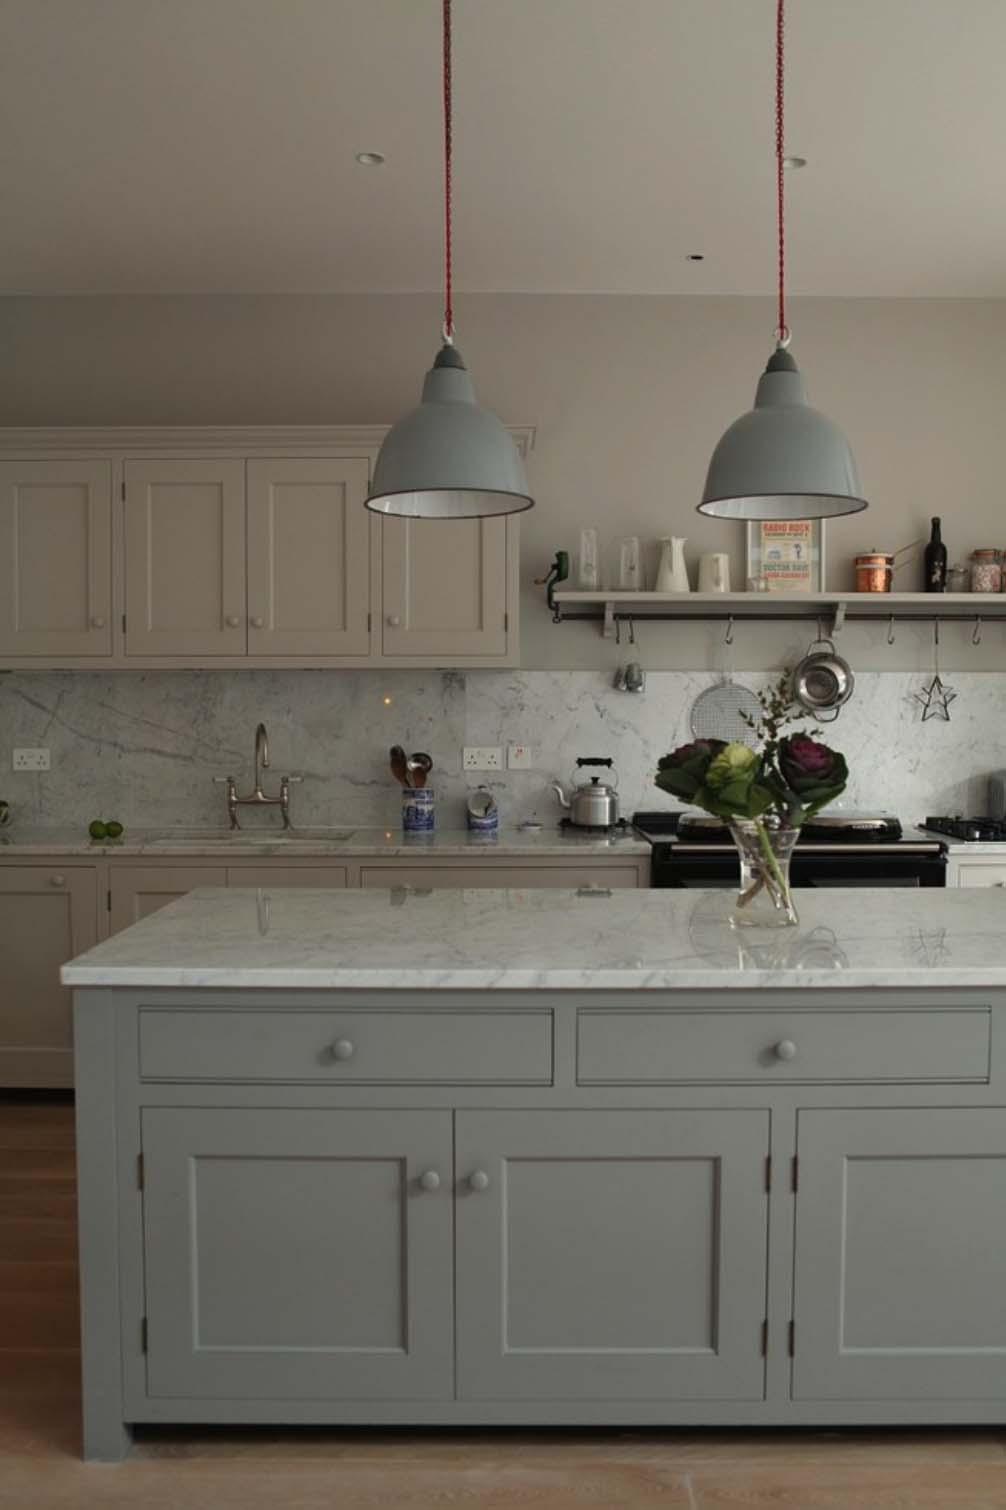 Restoration Hardware Pendant Lights Kitchen